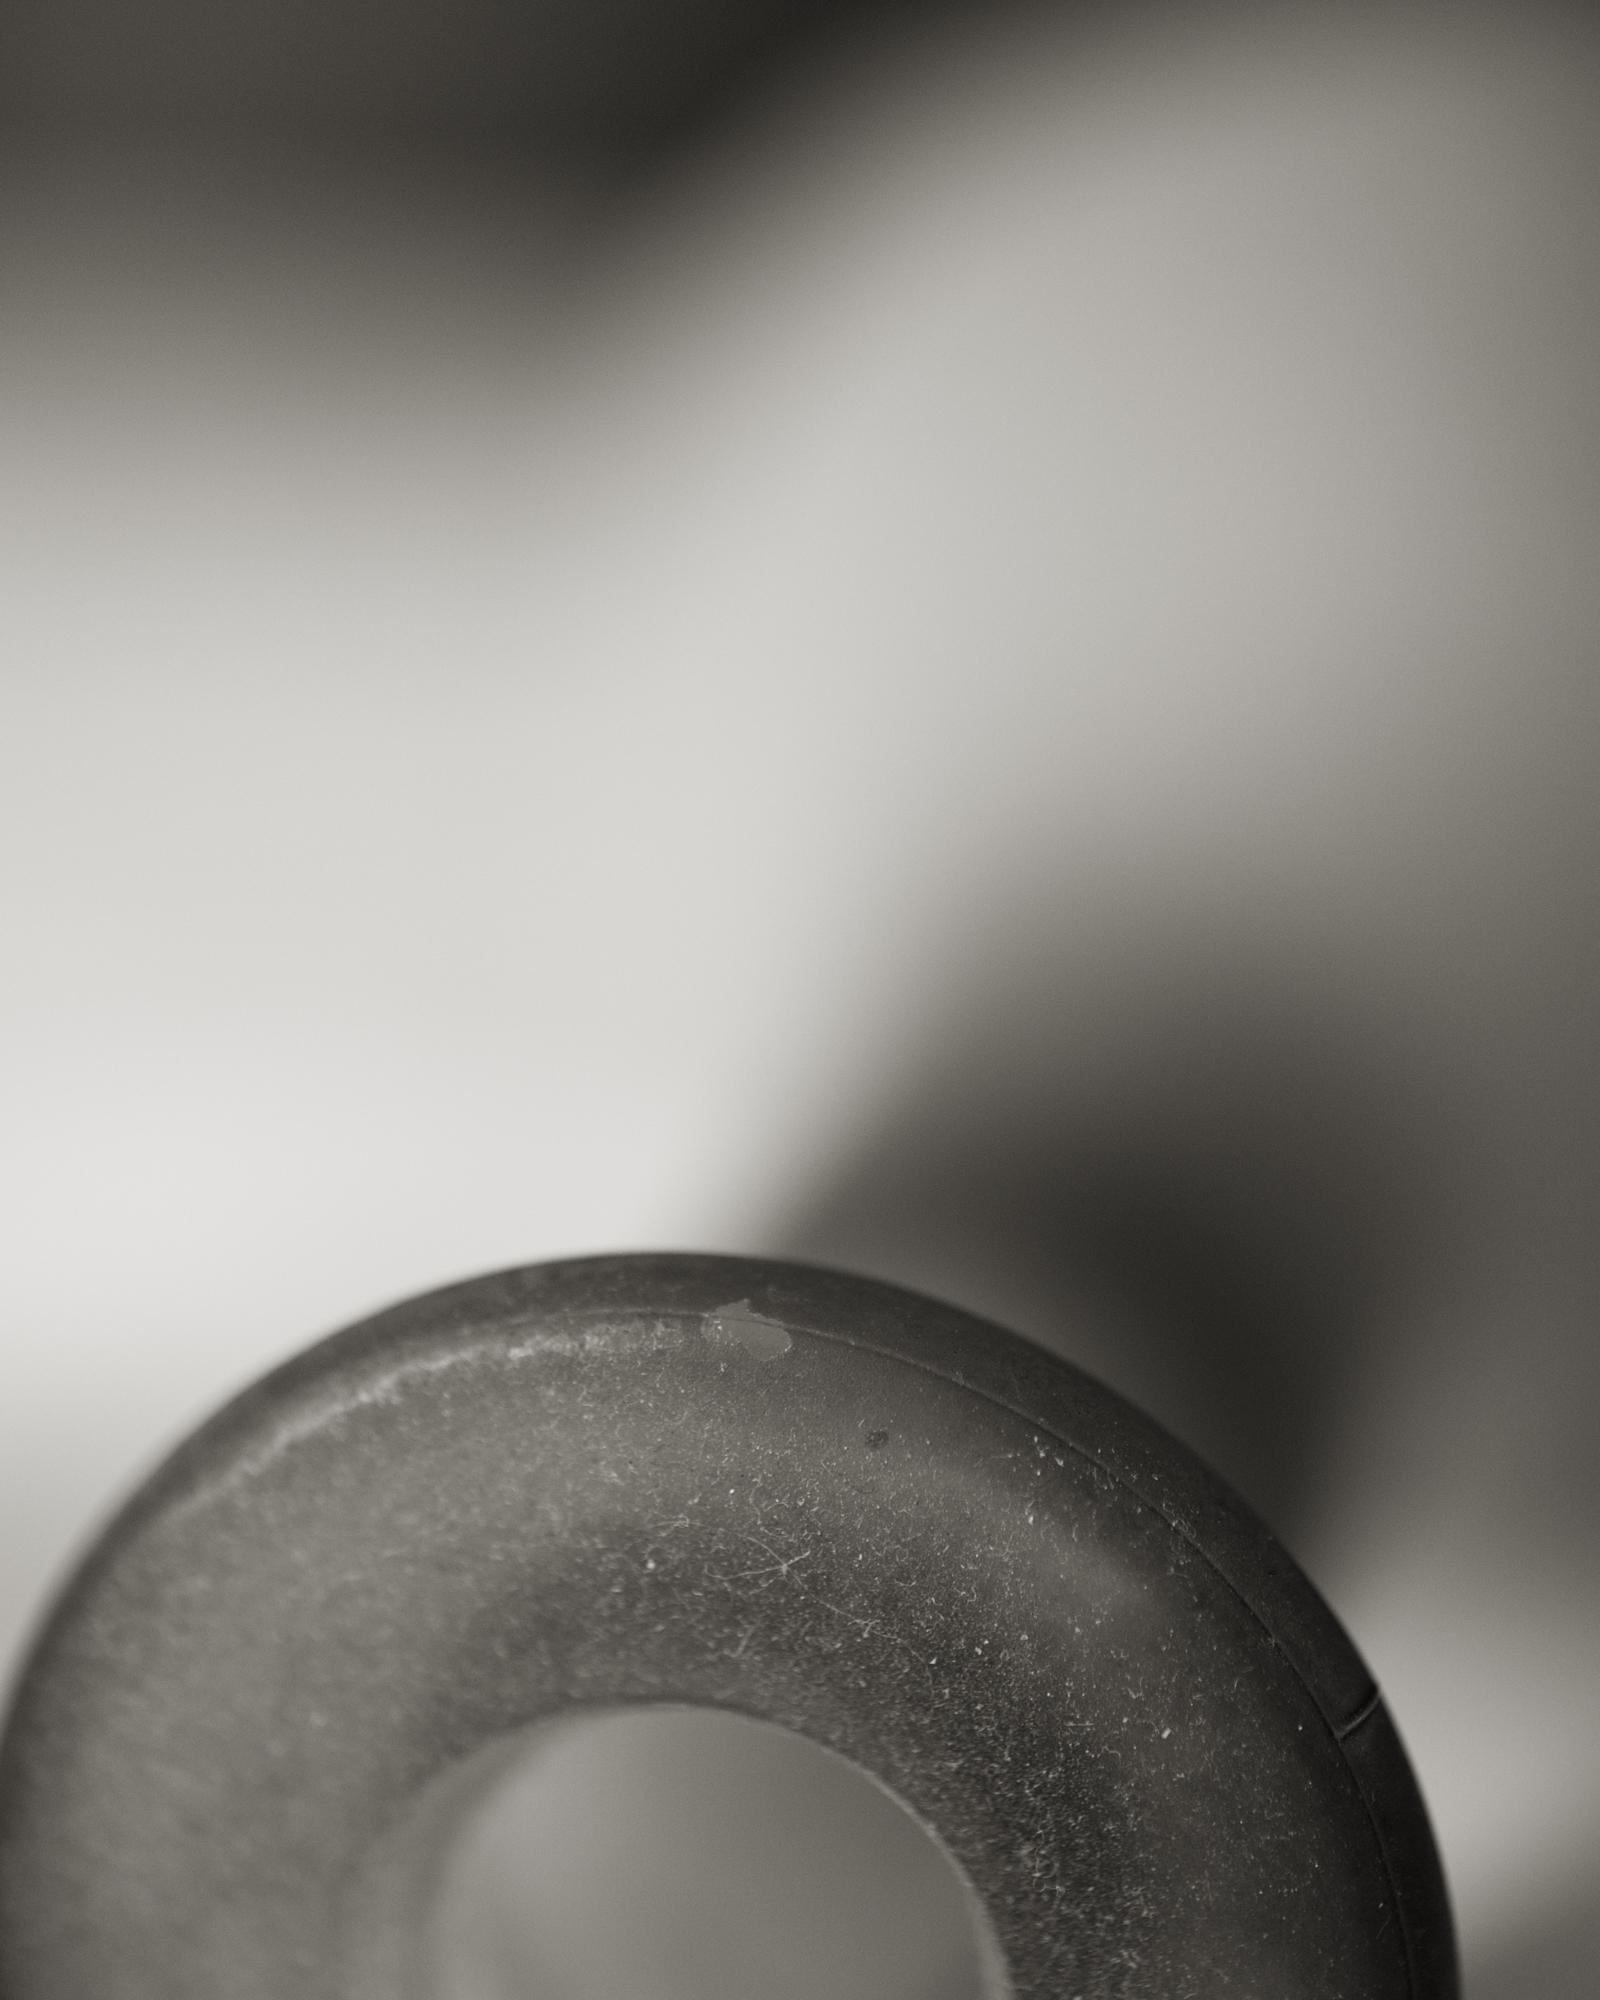 _DSC0112-Edit monochrome 16x20 toned.jpg